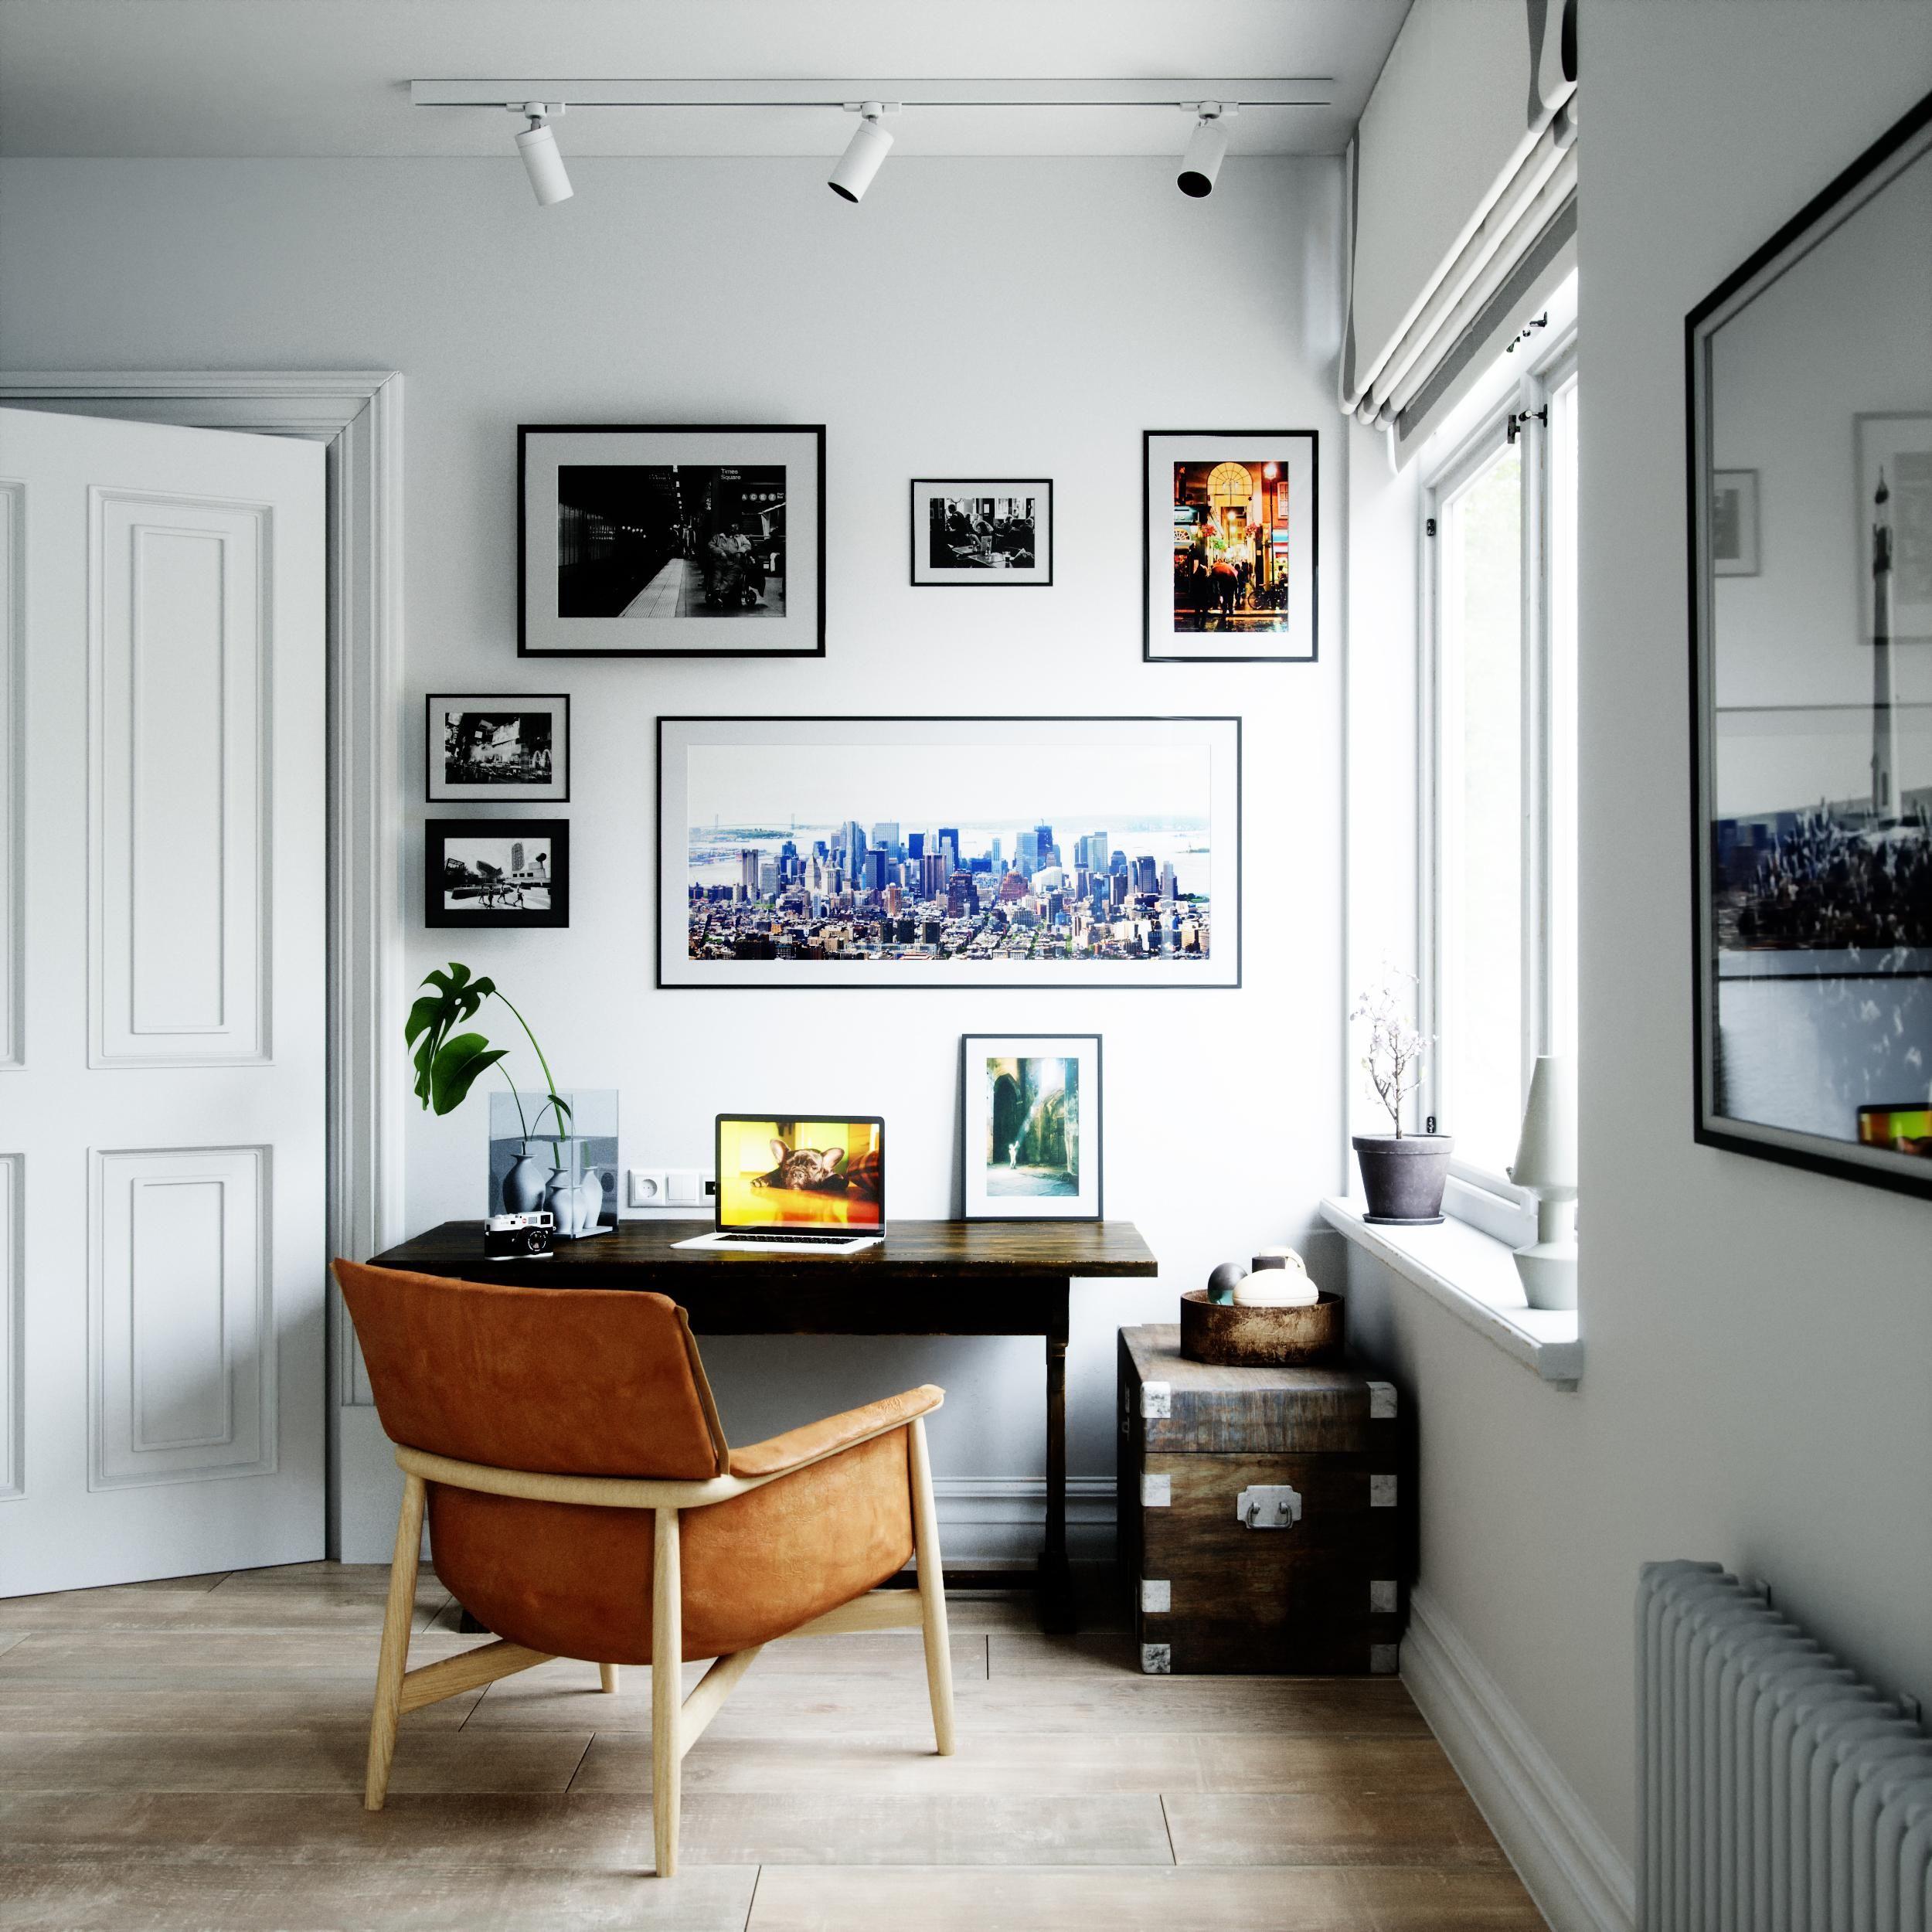 Warm corner ds max fstorm no post  oc homedecor homedecorideas room interiors interiordesign home also rh pinterest